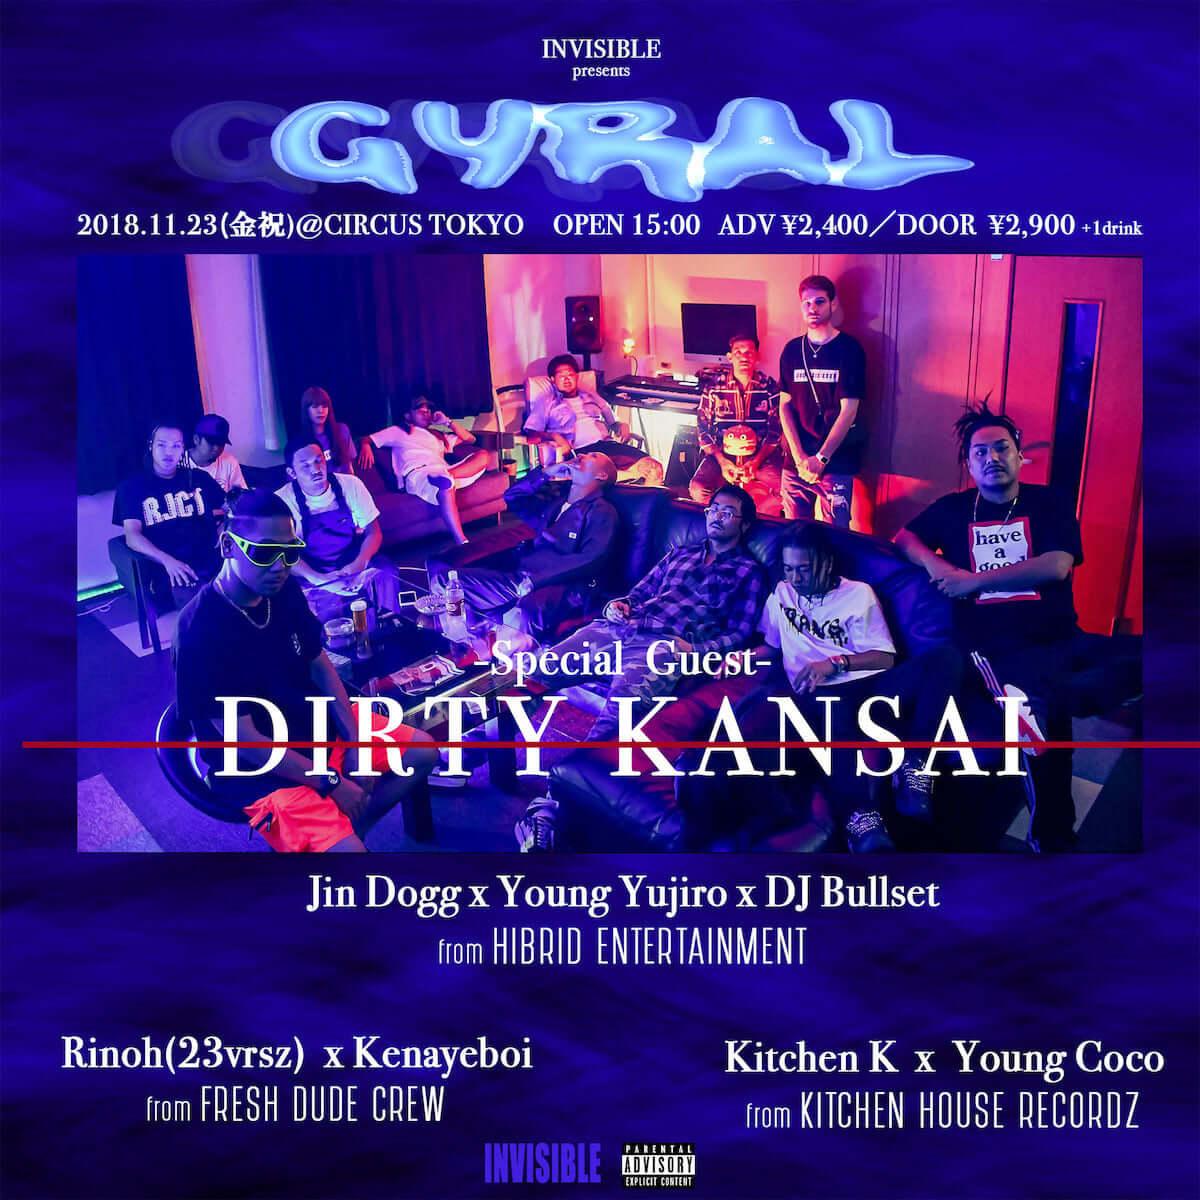 加熱する関西 TRAP MOVEMENT 〜DIRTY KANSAI〜 【Fresh Dude Crew編】 dirty-kansai-1200x1200